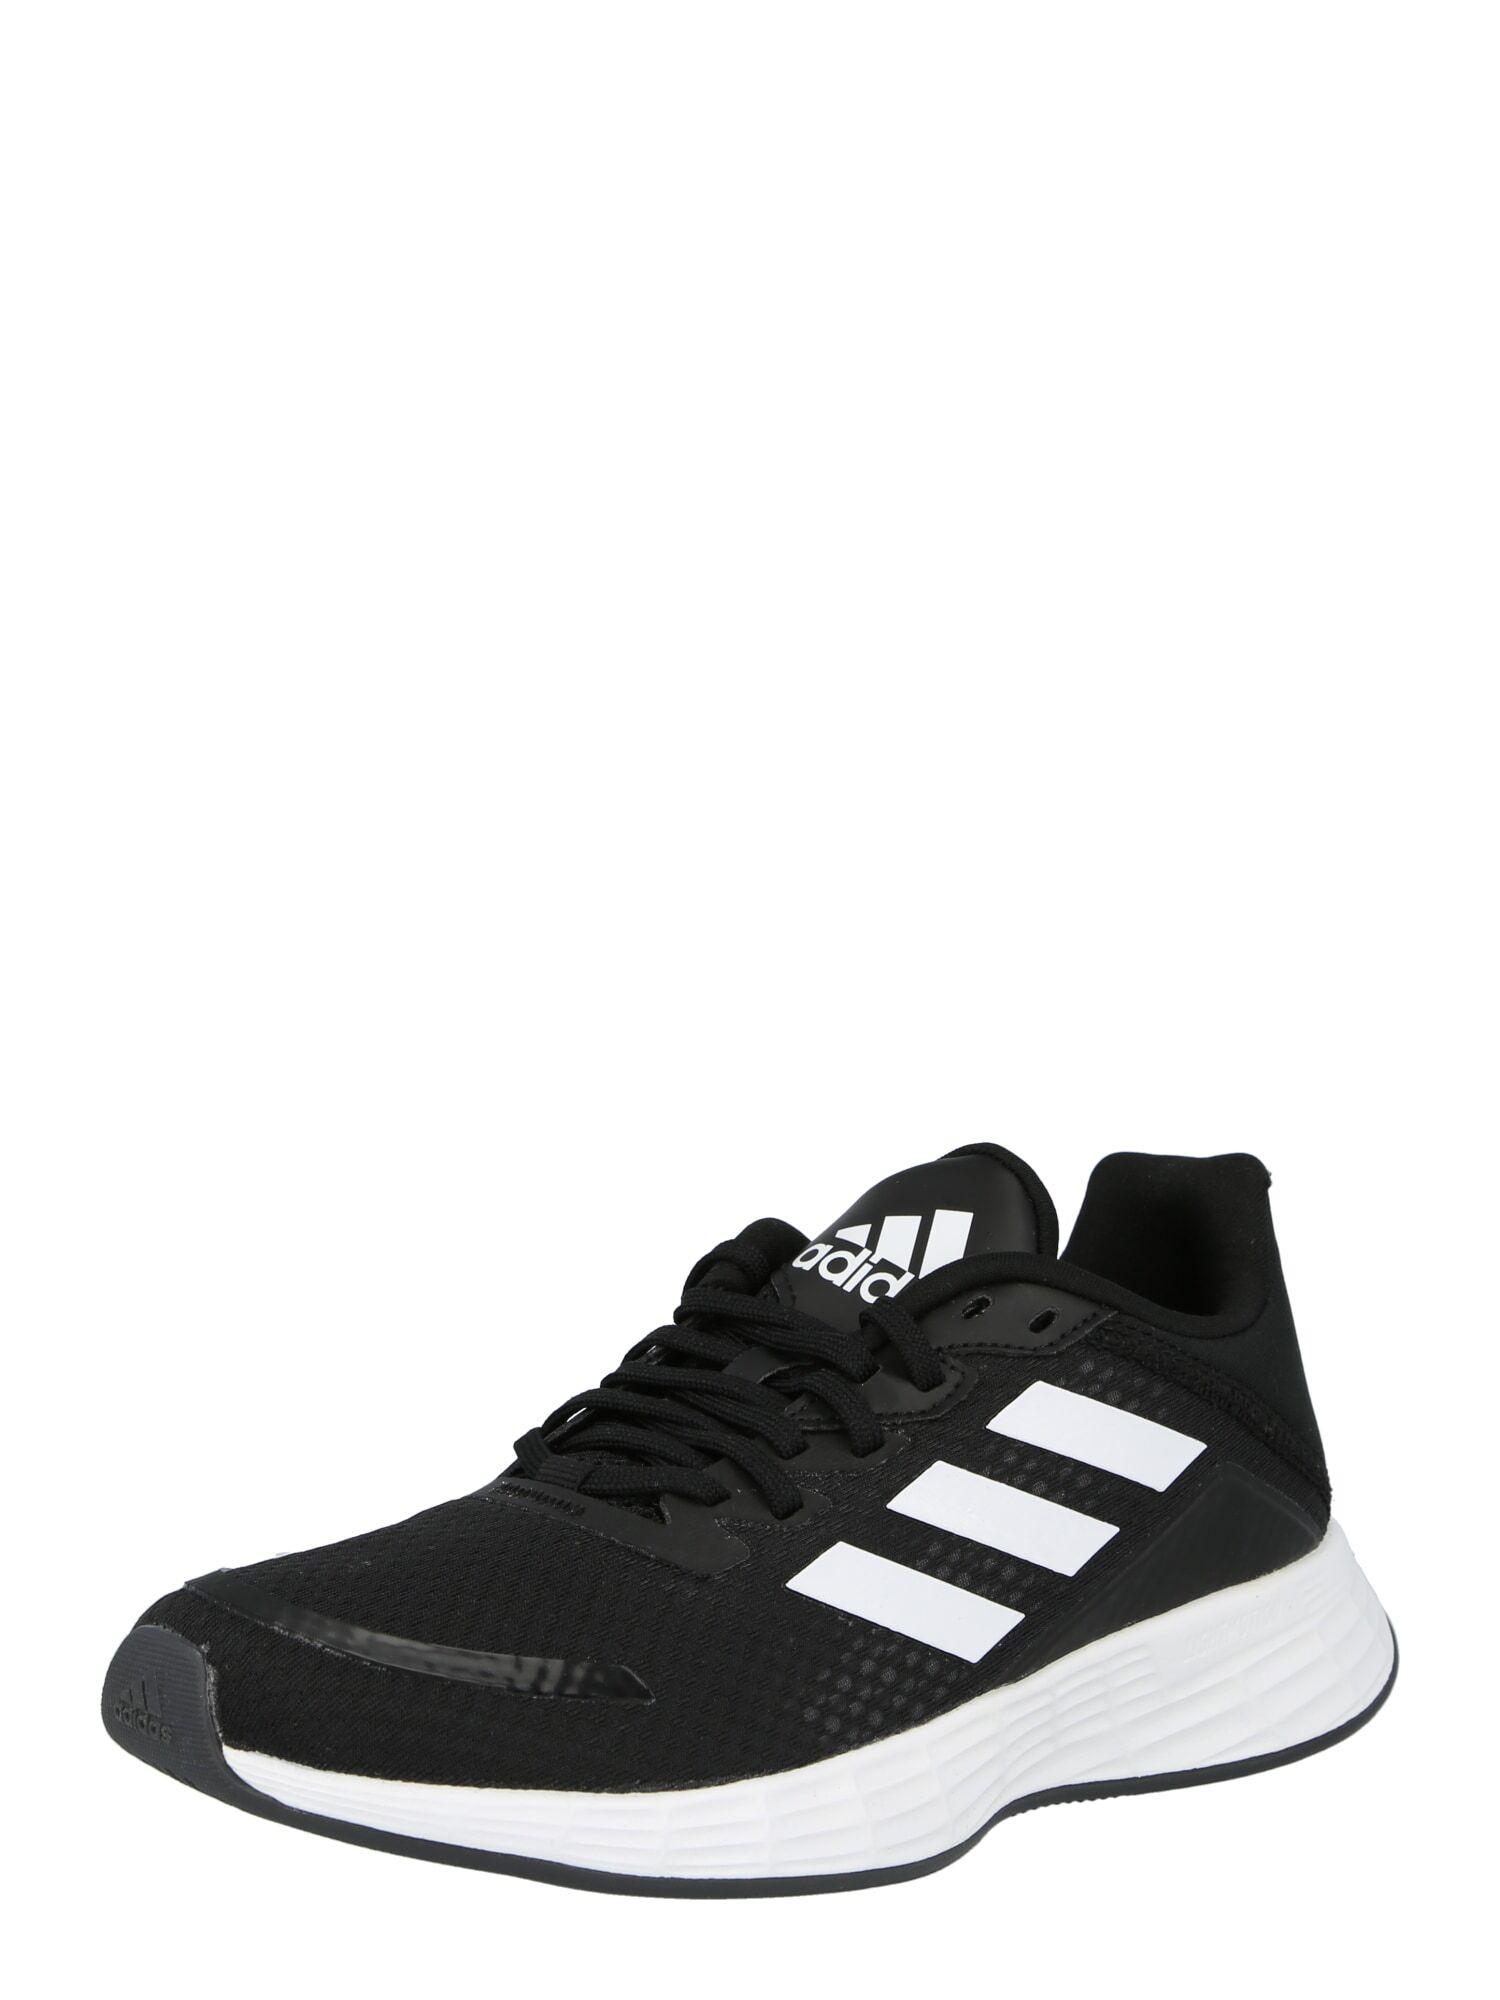 adidas performance scarpa da corsa 'duramo' nero